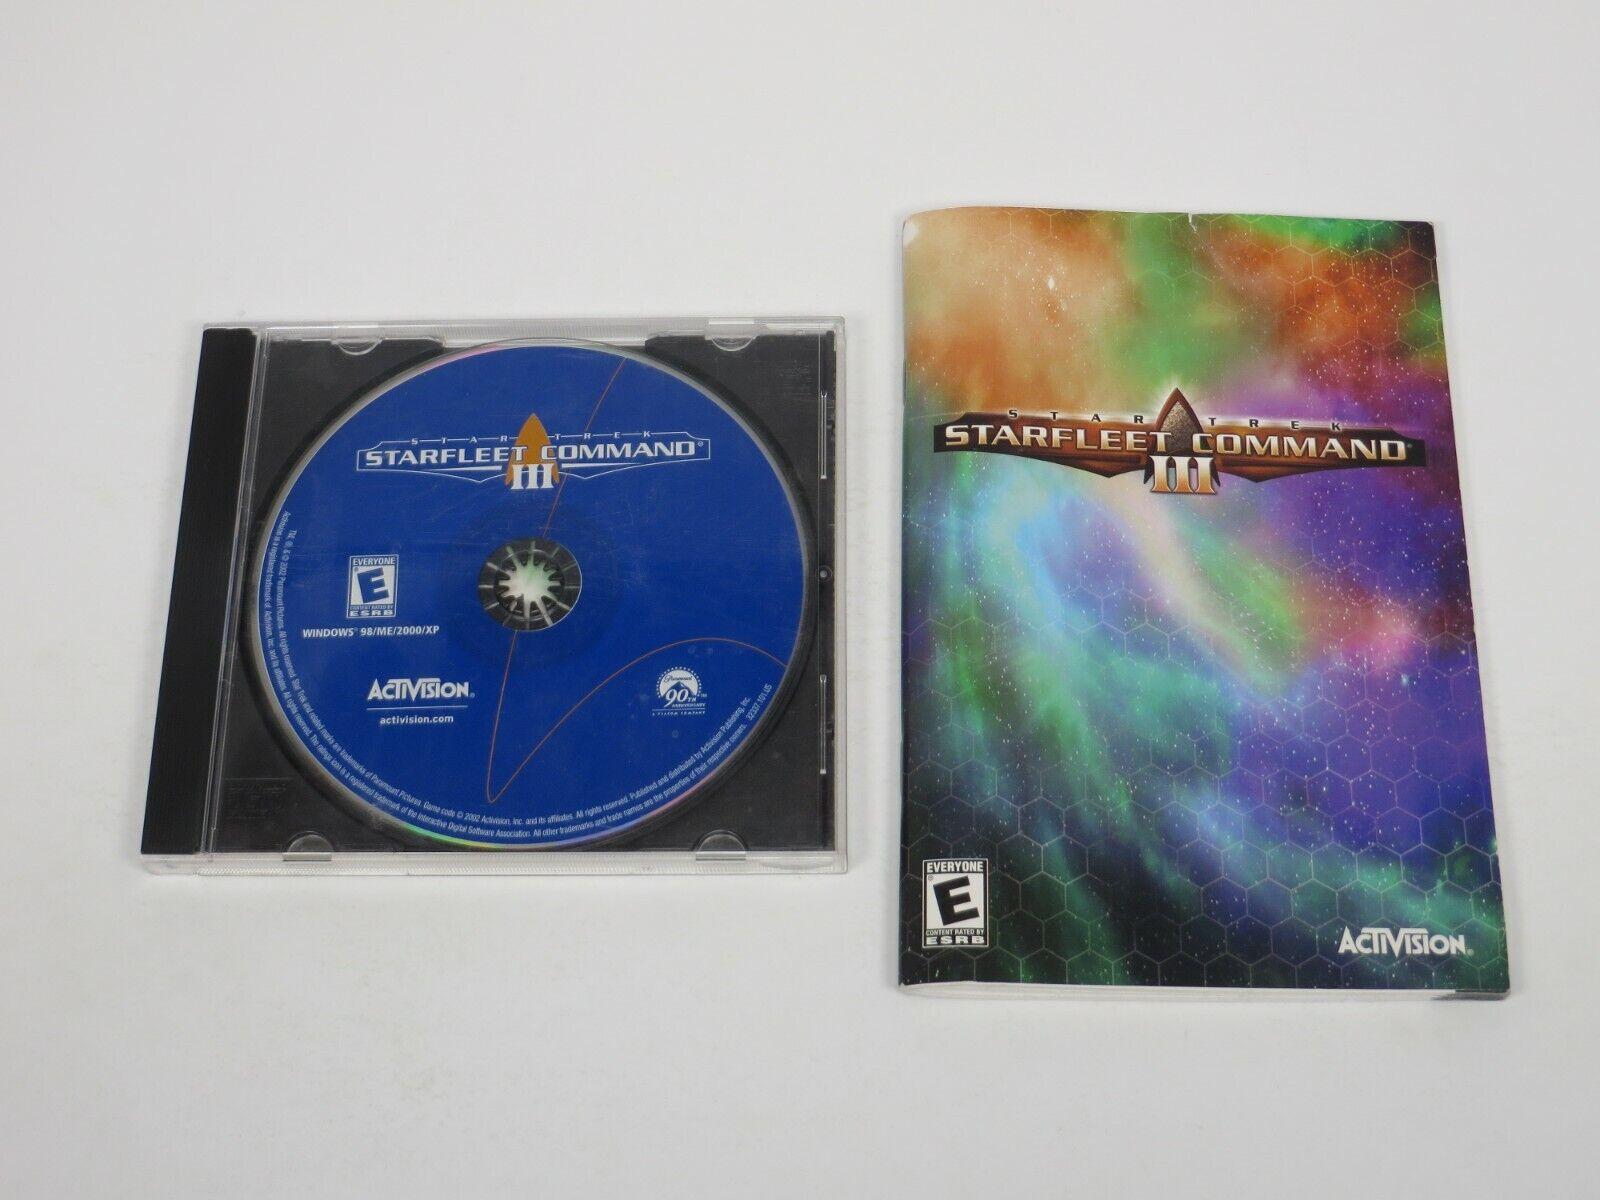 Computer Games - Star Trek: StarFleet Command III (PC, 2002) PC Computer Game Activision